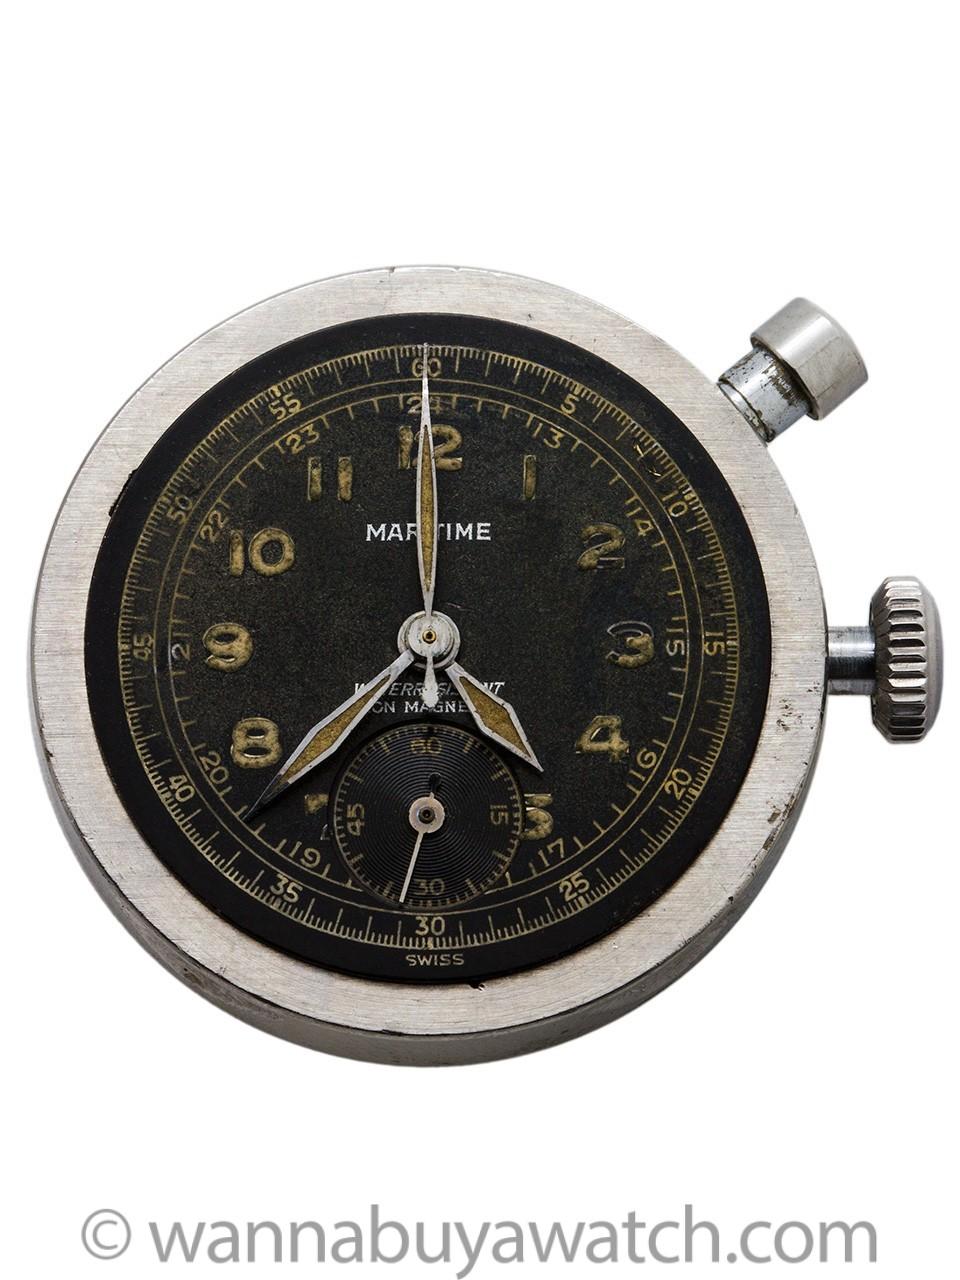 Maritime SS Chronograph Boy's Size circa 1940's